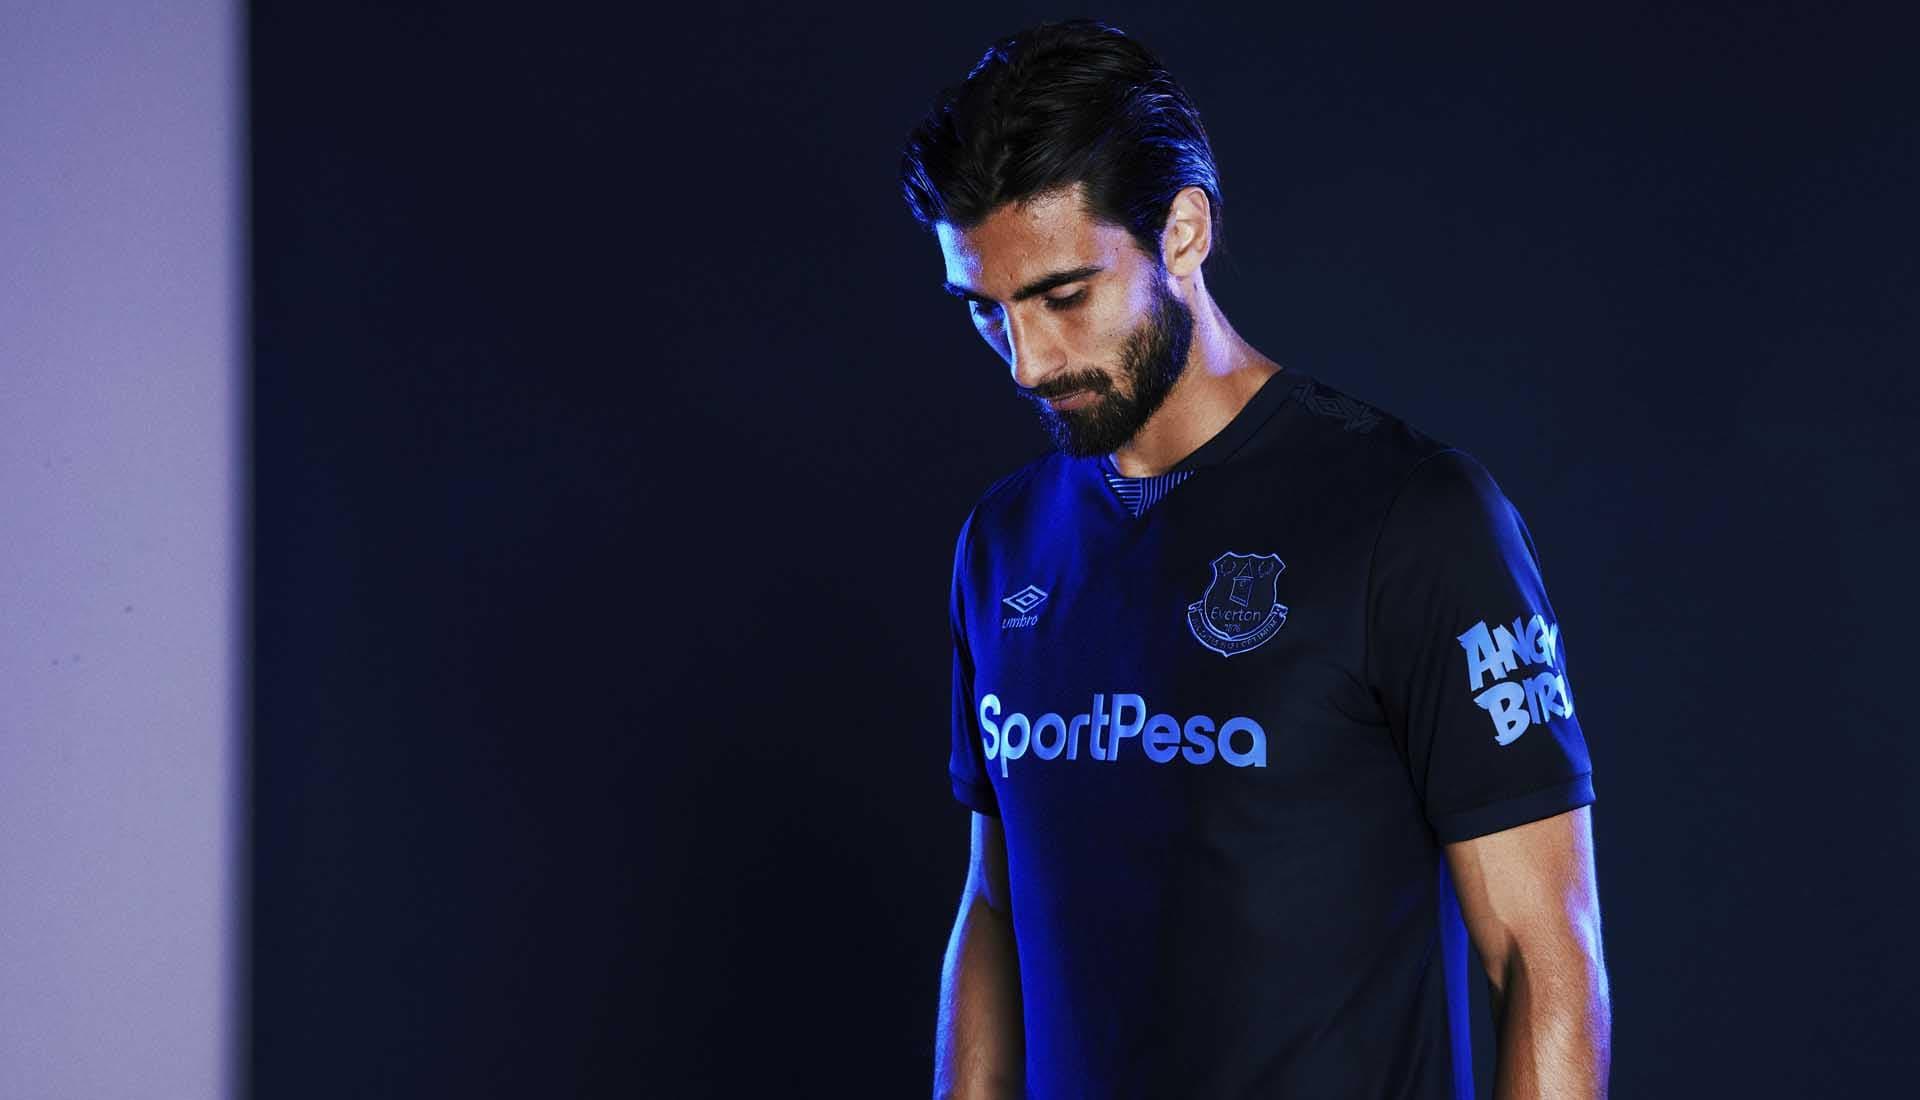 uk availability 4c1ed dd5de Umbro Launch Everton 2019/20 Third Shirt - SoccerBible